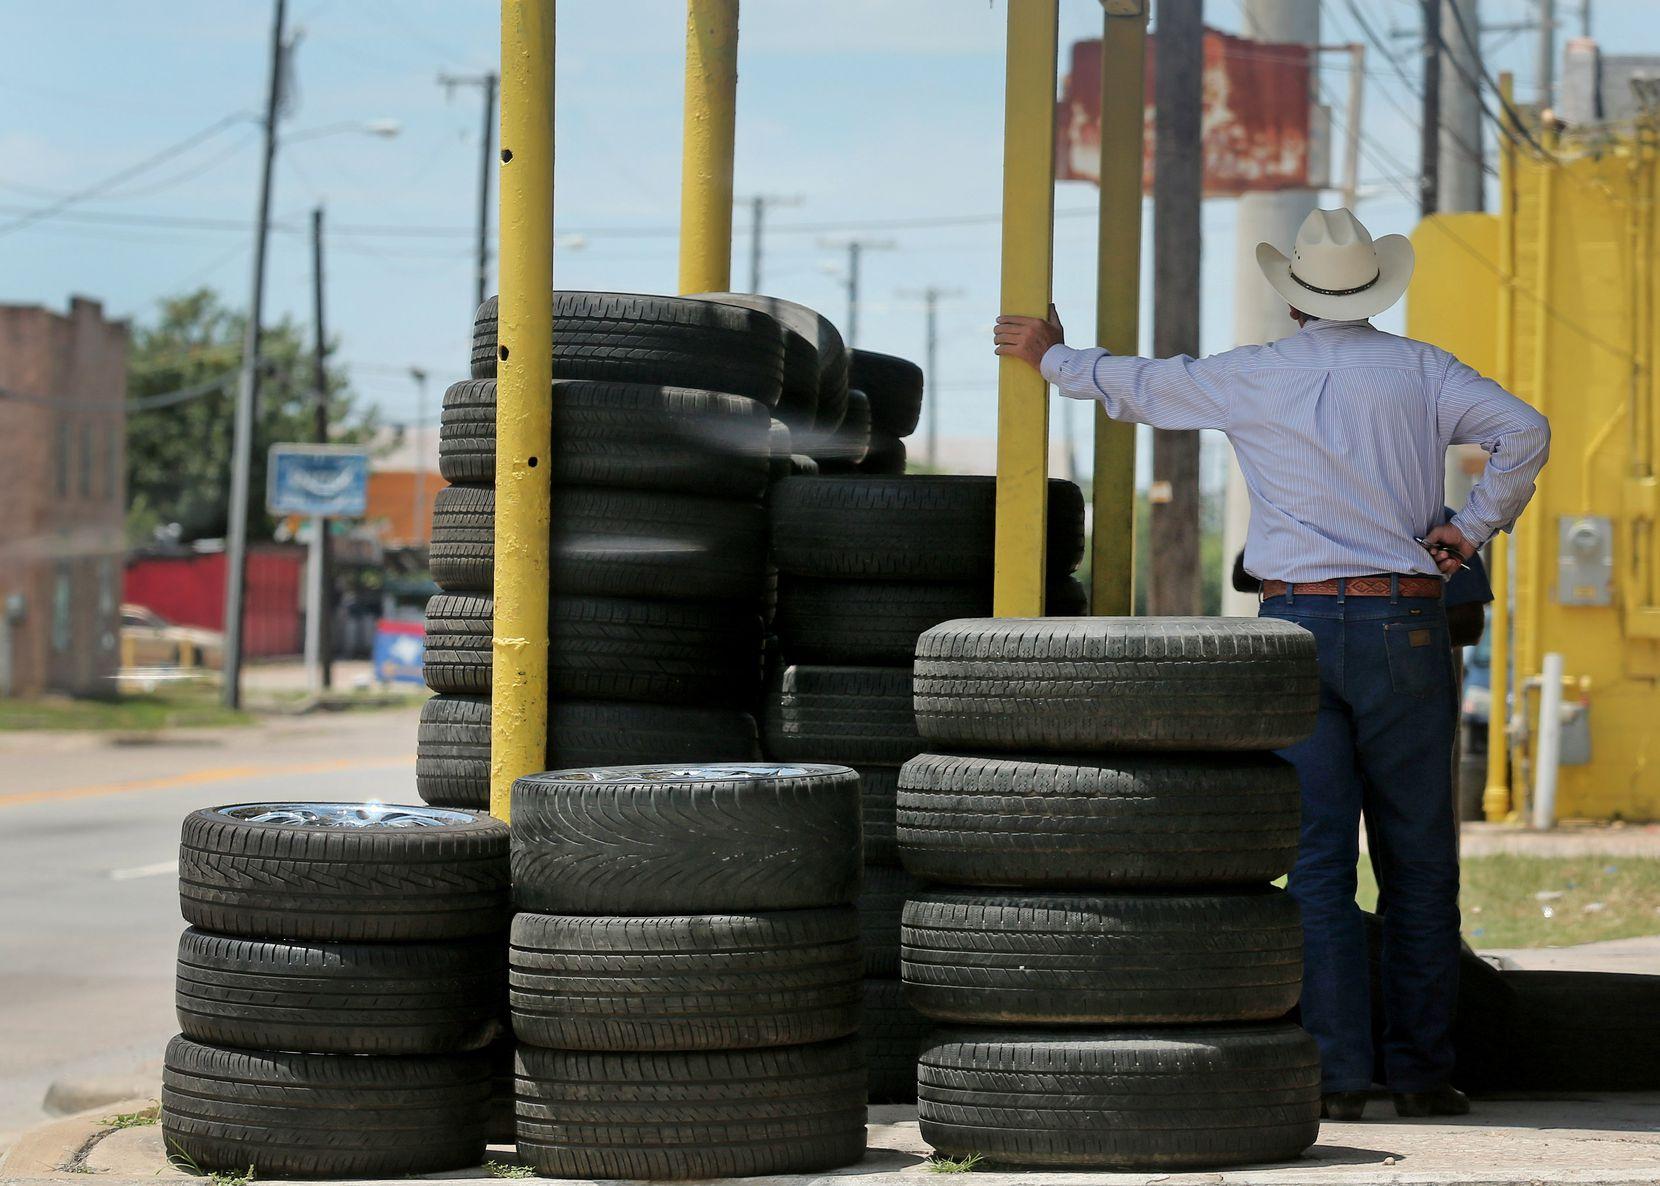 A tire shop employee awaits customers on Singleton Boulevard in West Dallas.